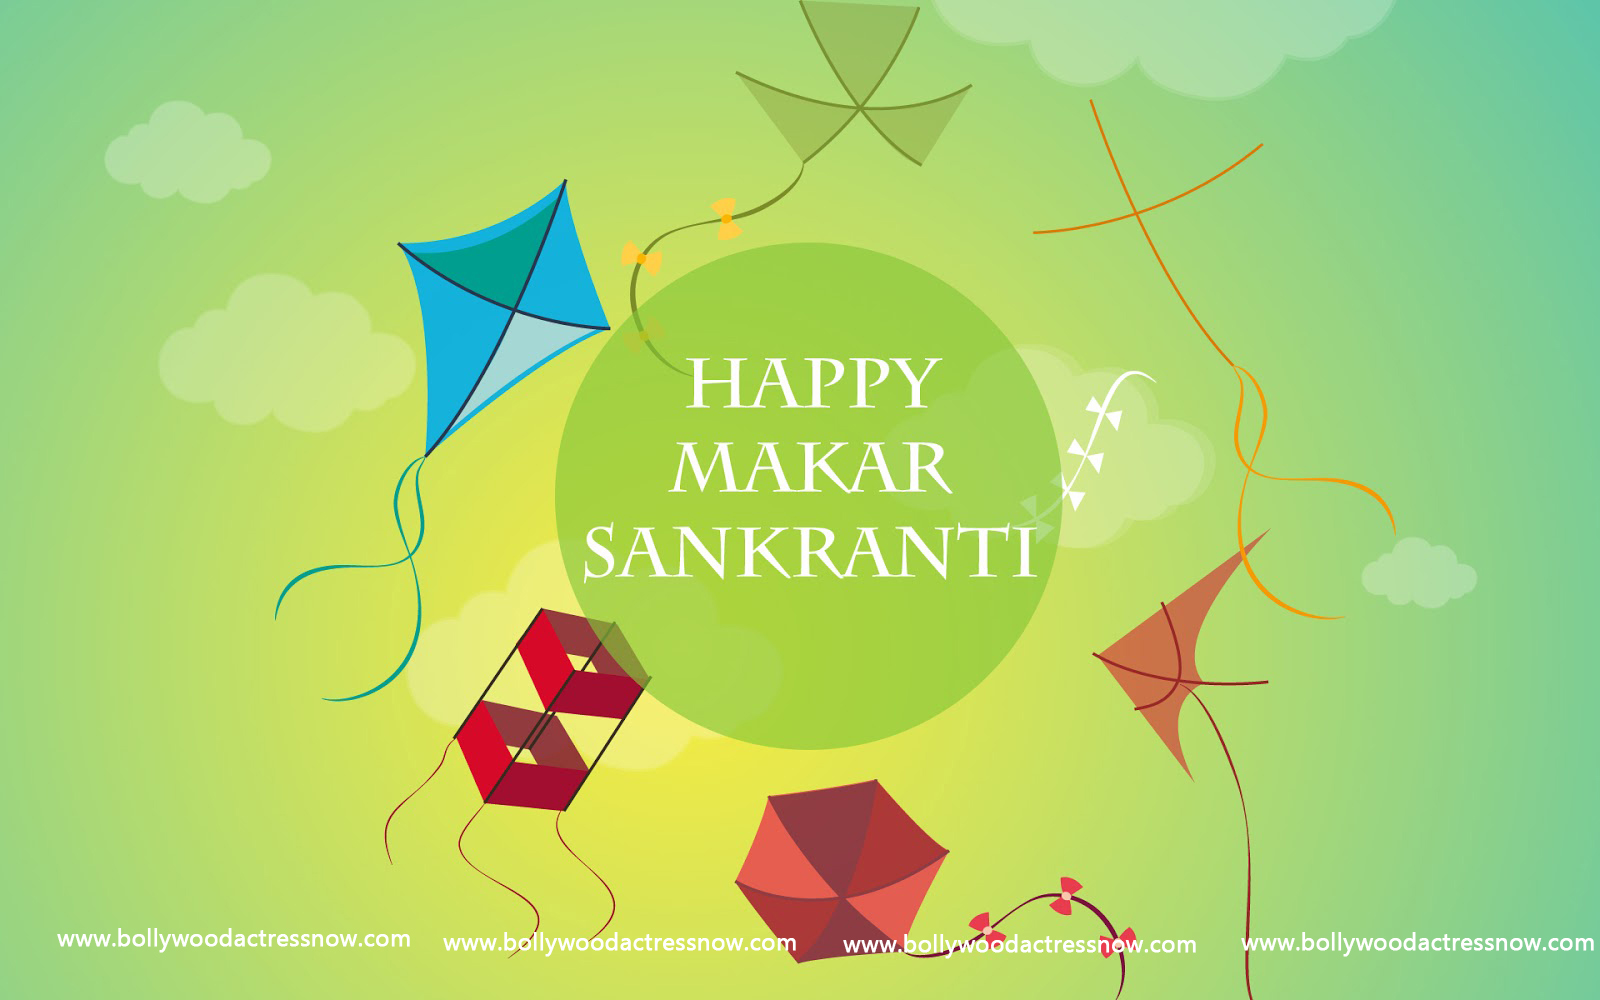 Happy Makar Sankranti Greetings Hd Wallpapers And Wishes 2017